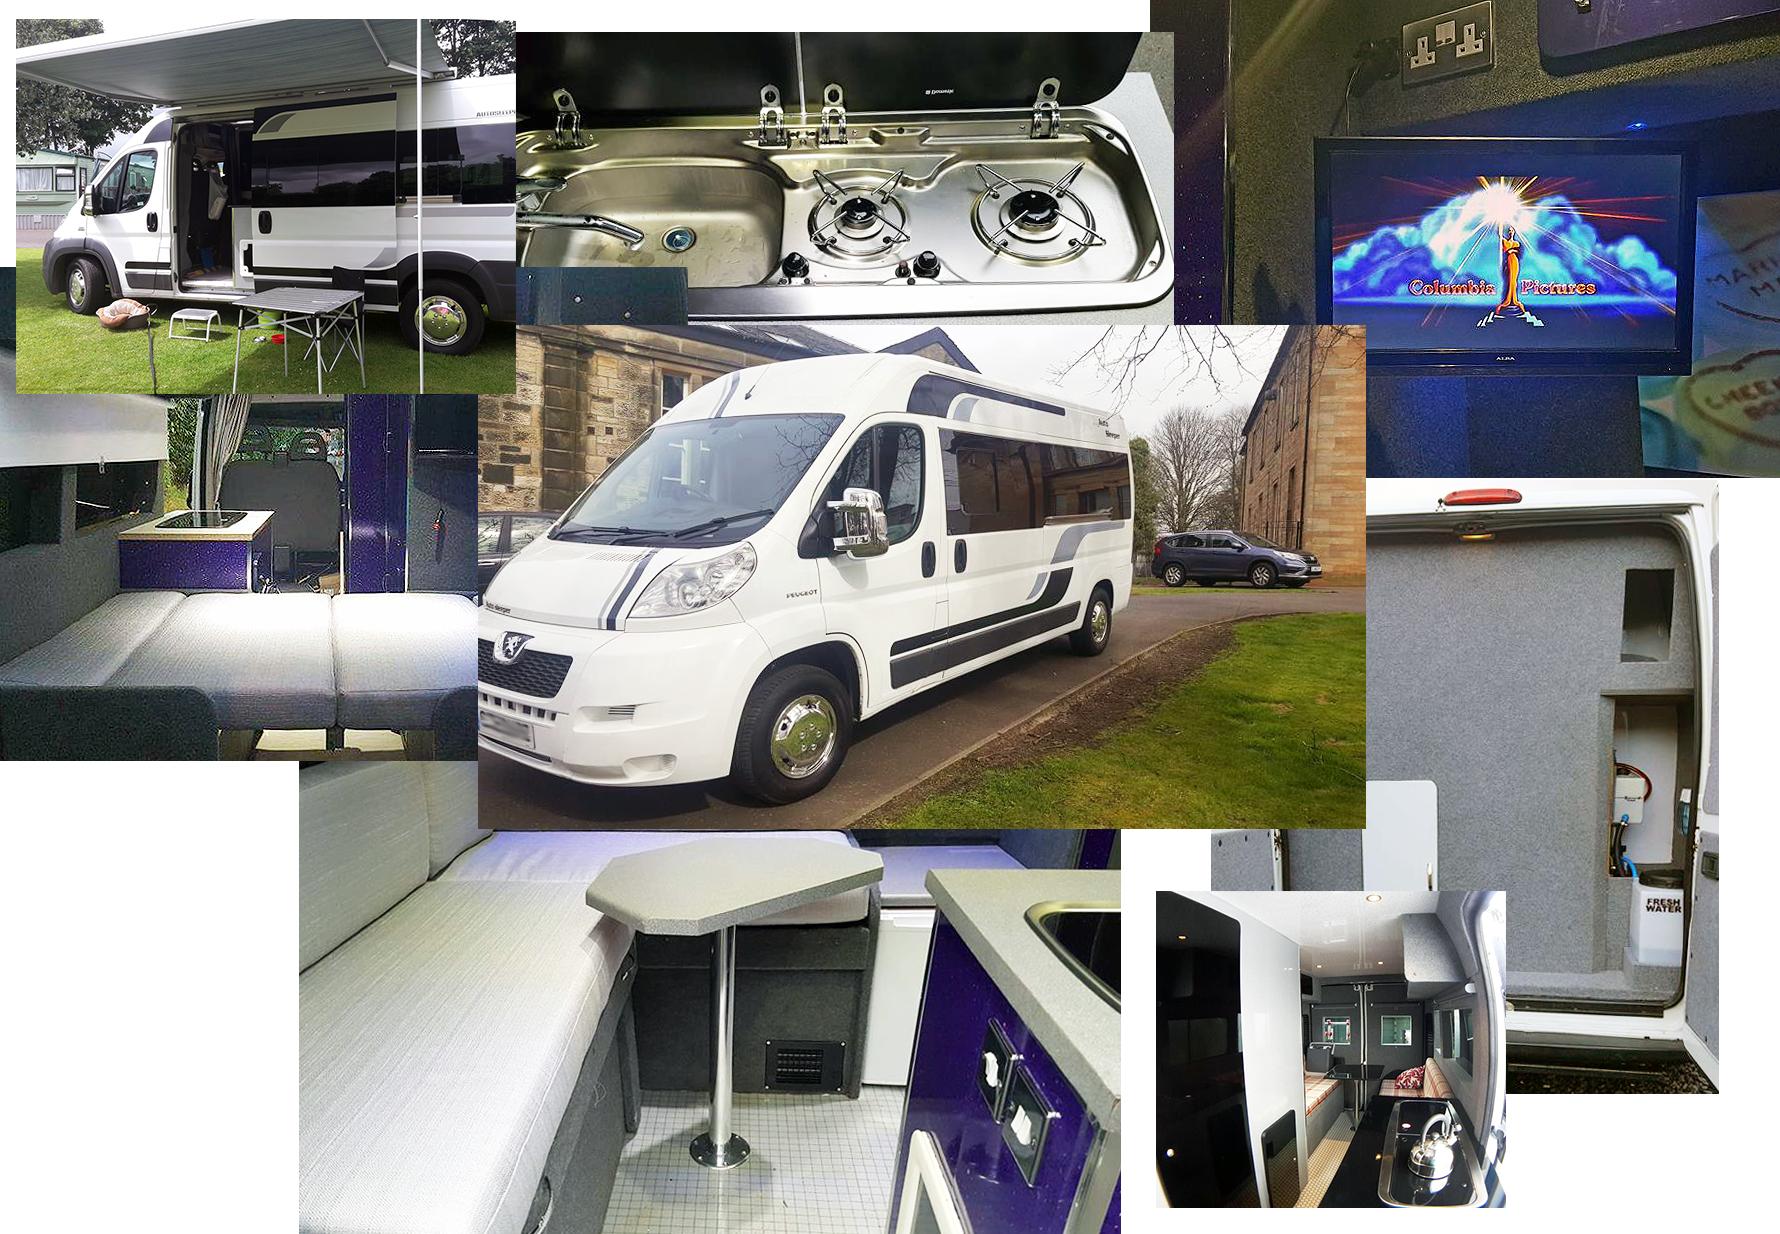 Minivan clipart campervan. Bespoke campervans ayrshire camper